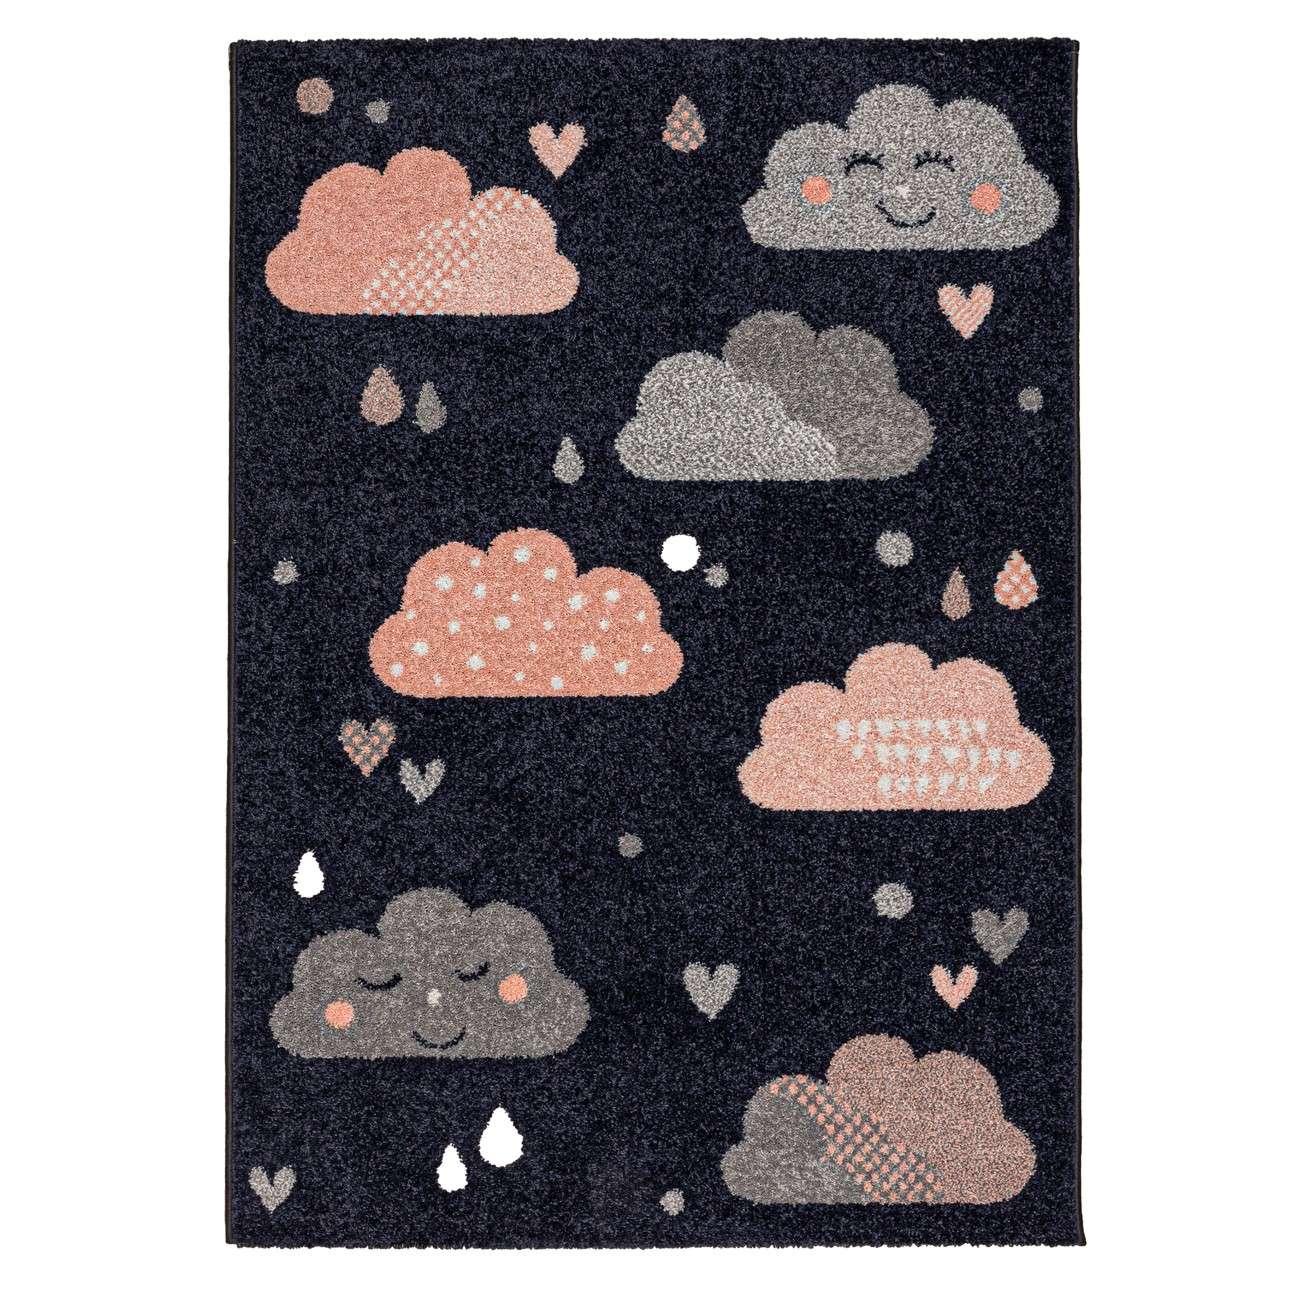 Summer Rain kilimas 160x230cm